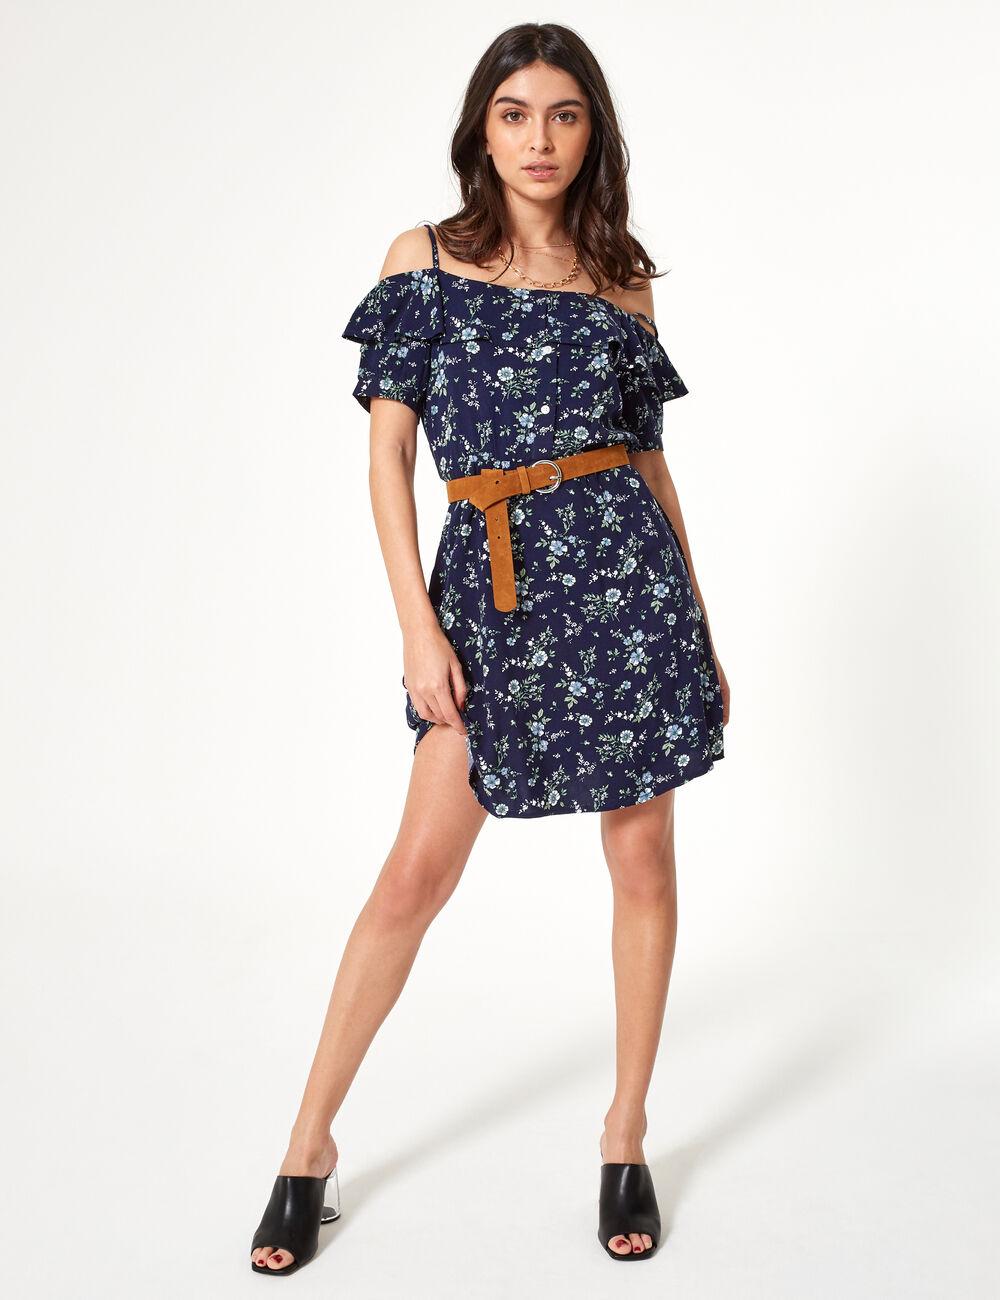 72b995b5a09e Blue floral off-the-shoulder dress woman • Jennyfer